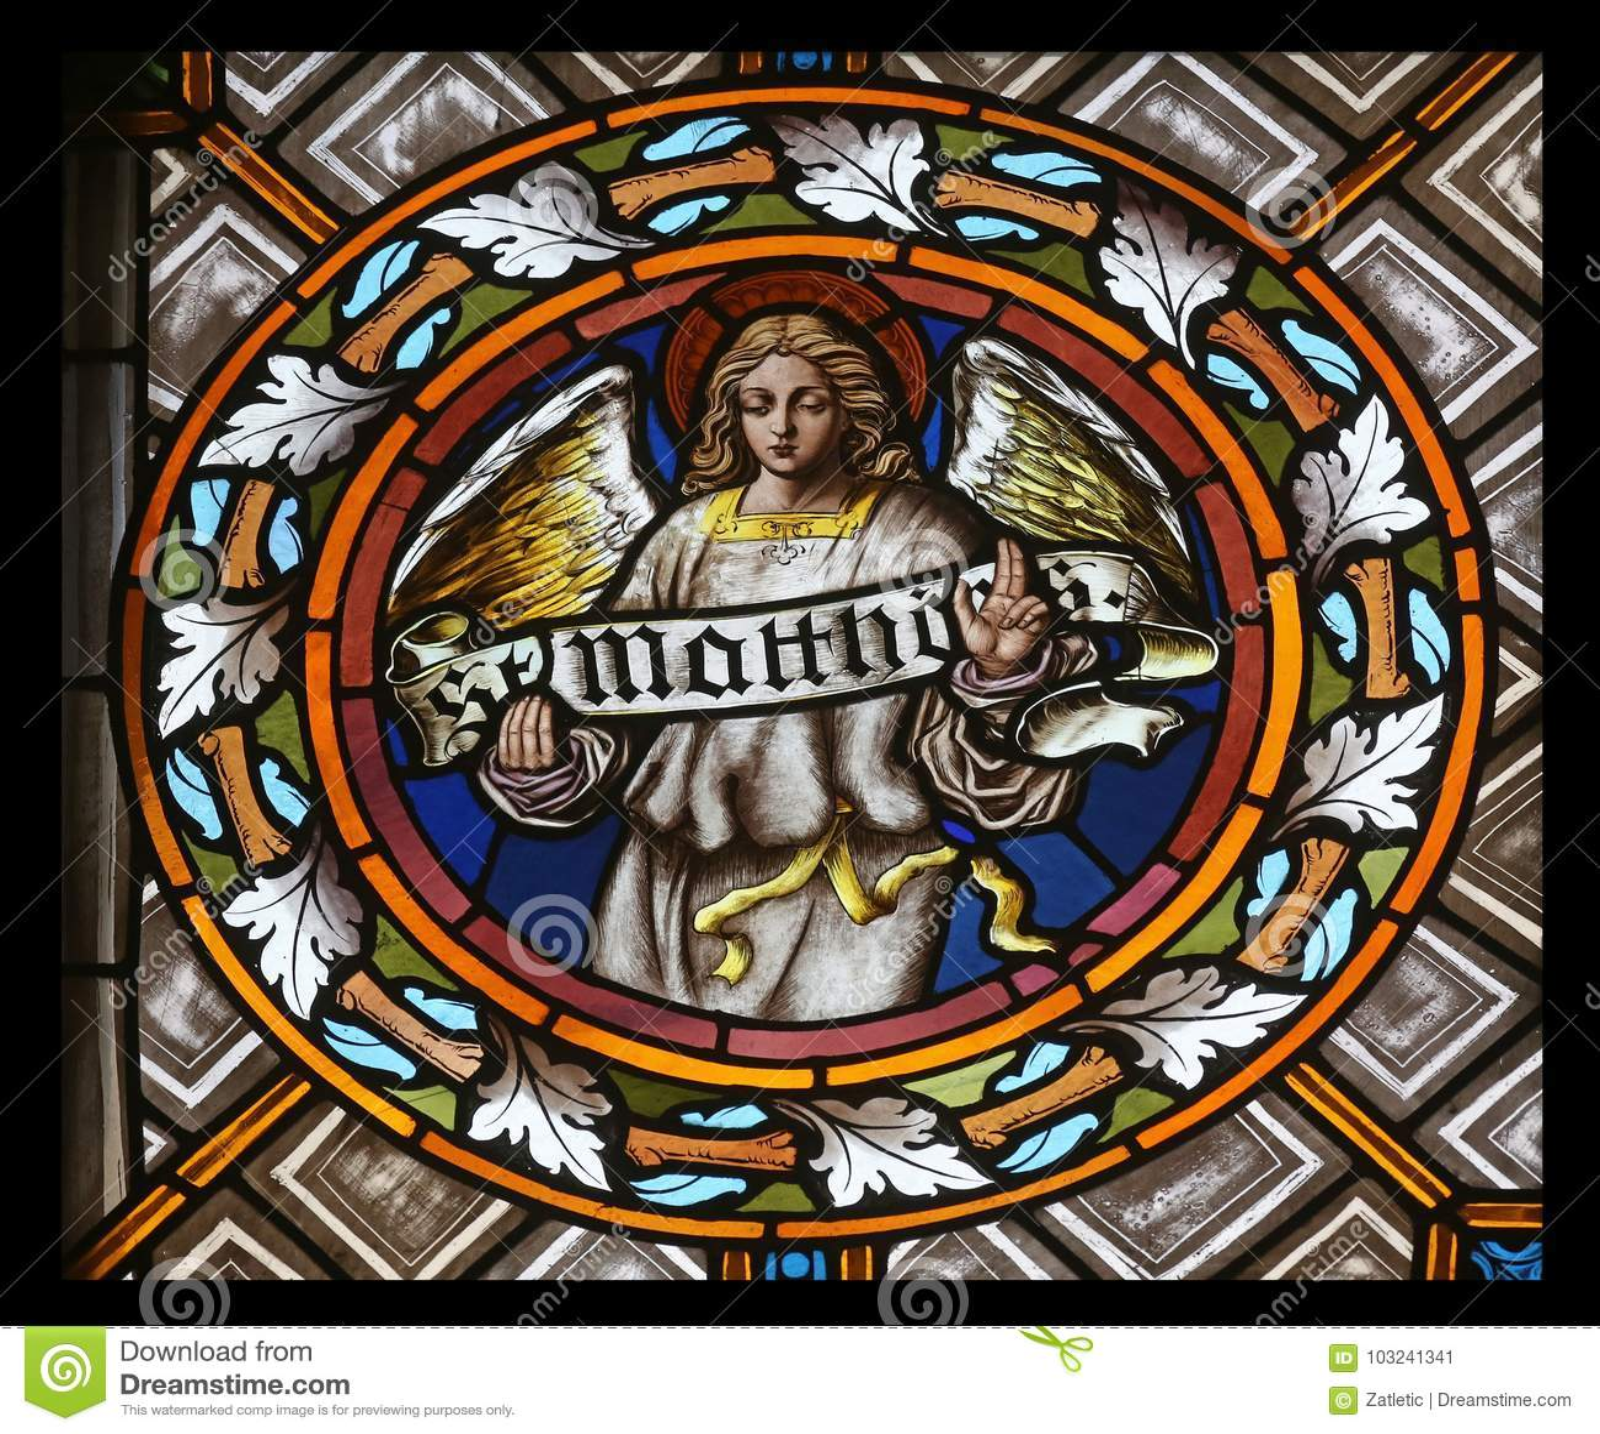 Symbol Of The Saint Matthew The Evangelist Stock Image Image Of